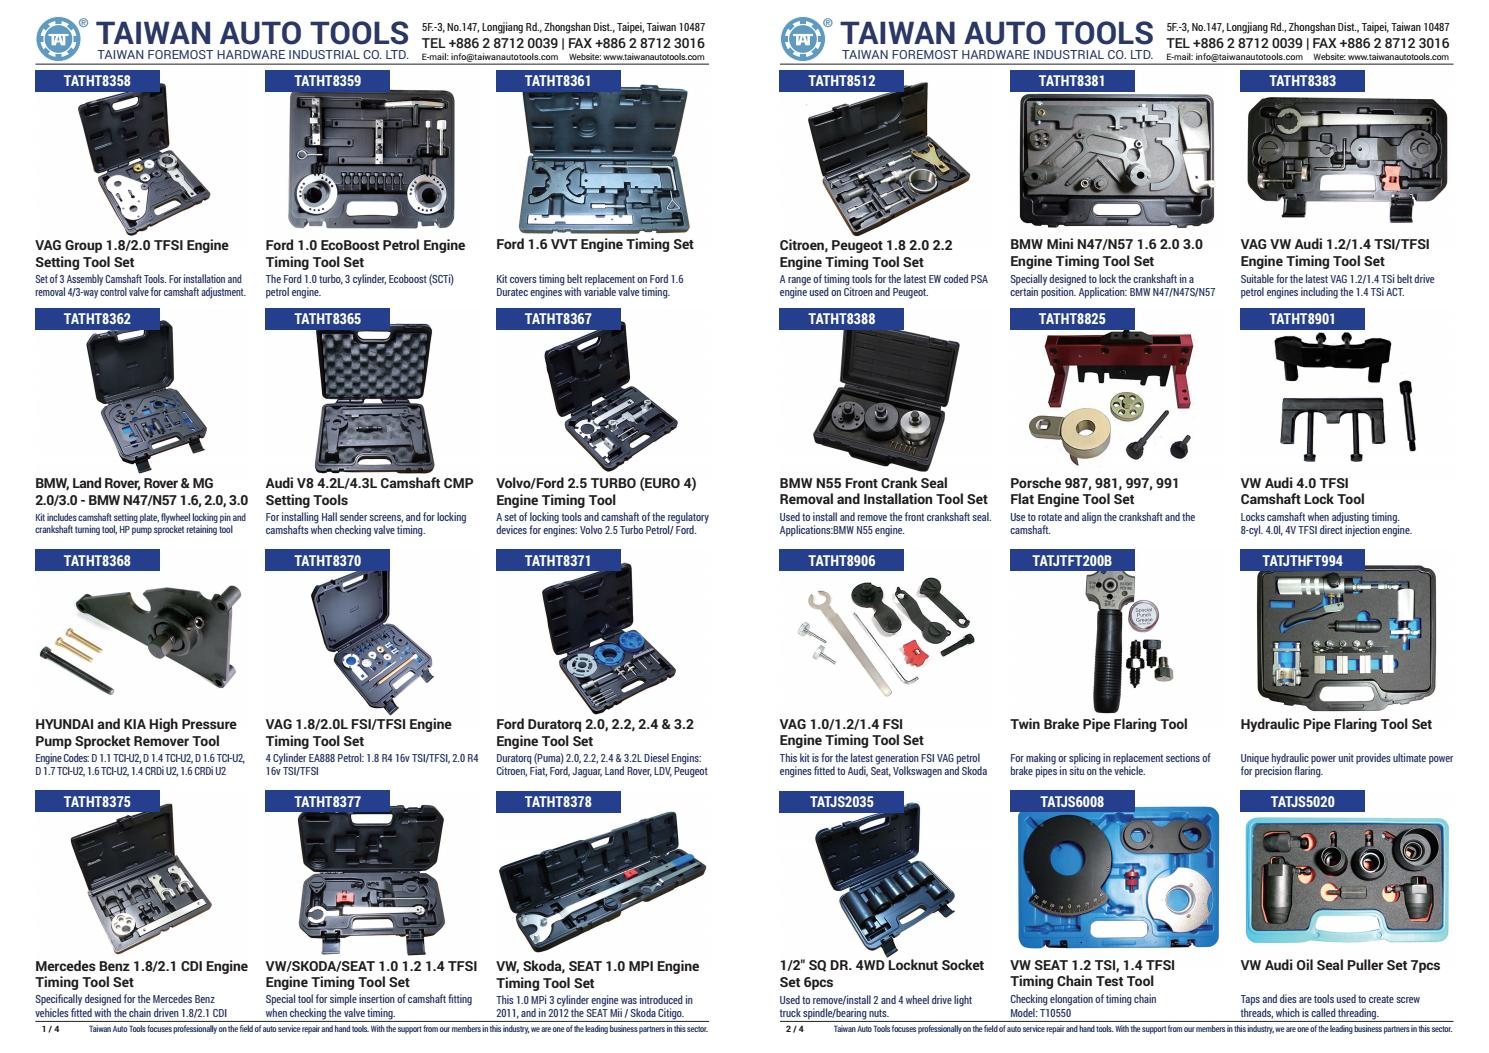 VW AUDI SEAT SKODA 1.2 1.4 1.6 TSI Engine Timing Locking Tool Petrol Belt ACT